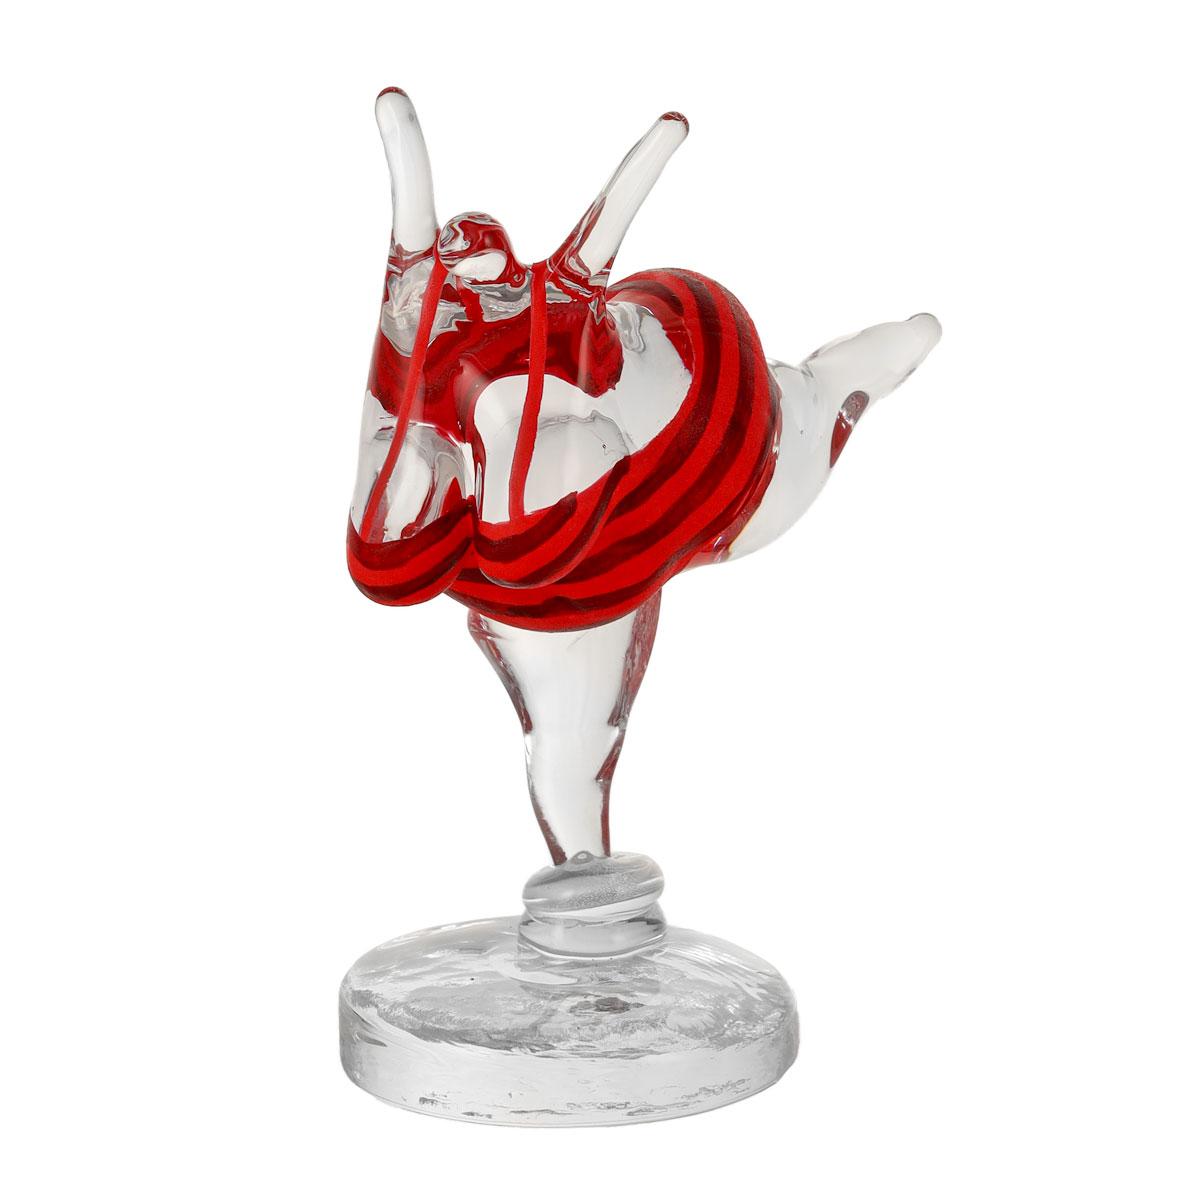 Kosta Boda Happiness Red Figure